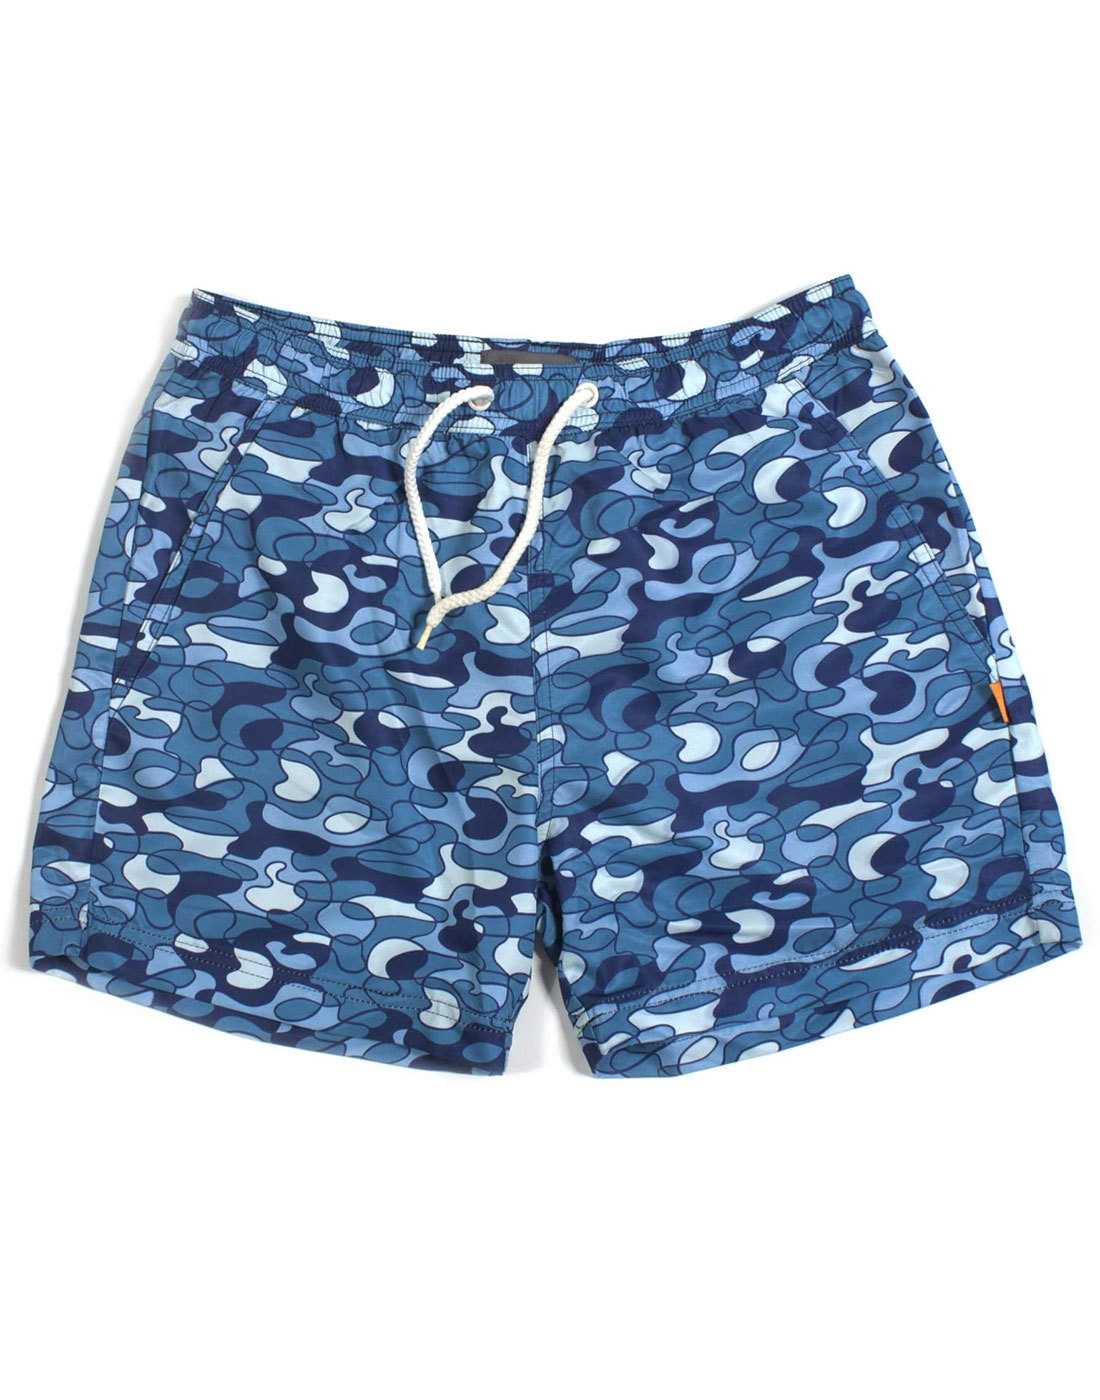 AFIELD Men's Retro 70s Pool Camo Swim Shorts